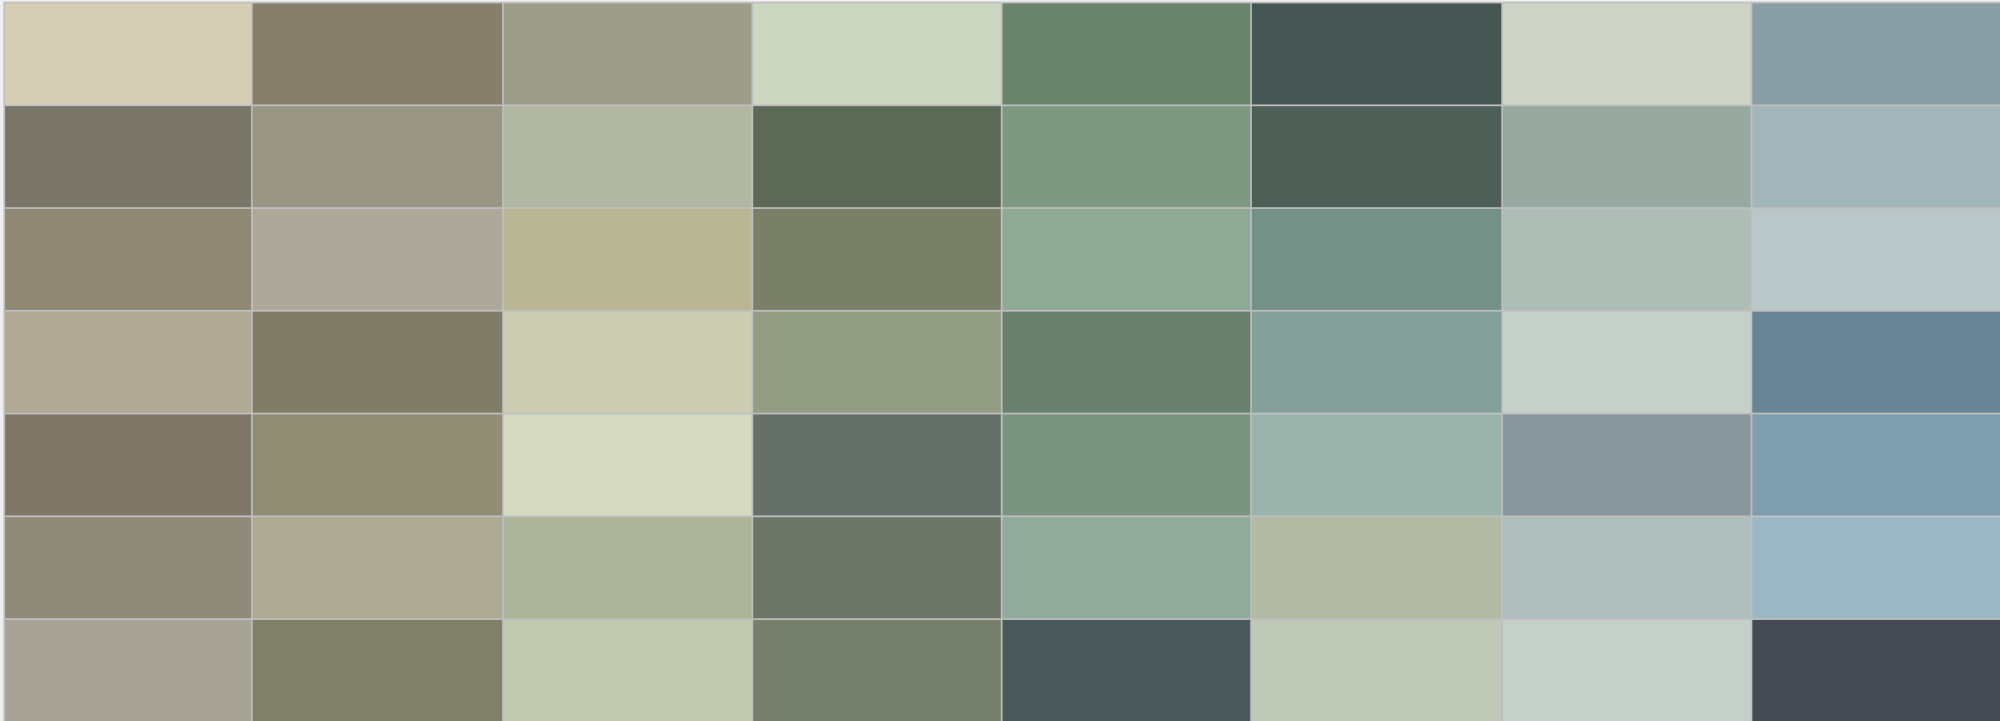 Art Studio Wall Colors | Choosing paint colors